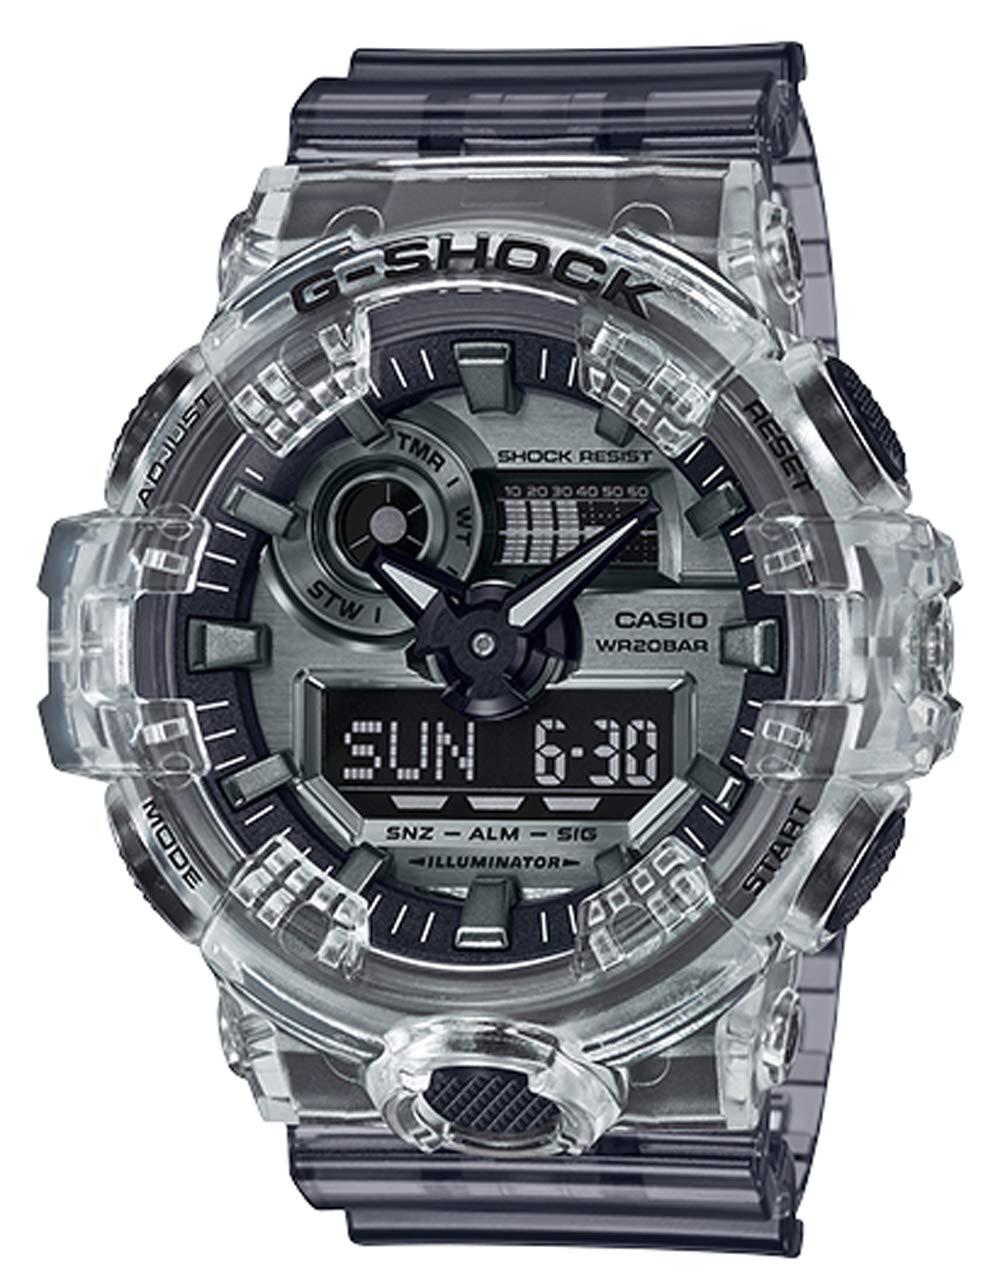 Amazon.com: Casio G-Shock GA700SK - Reloj analógico digital ...